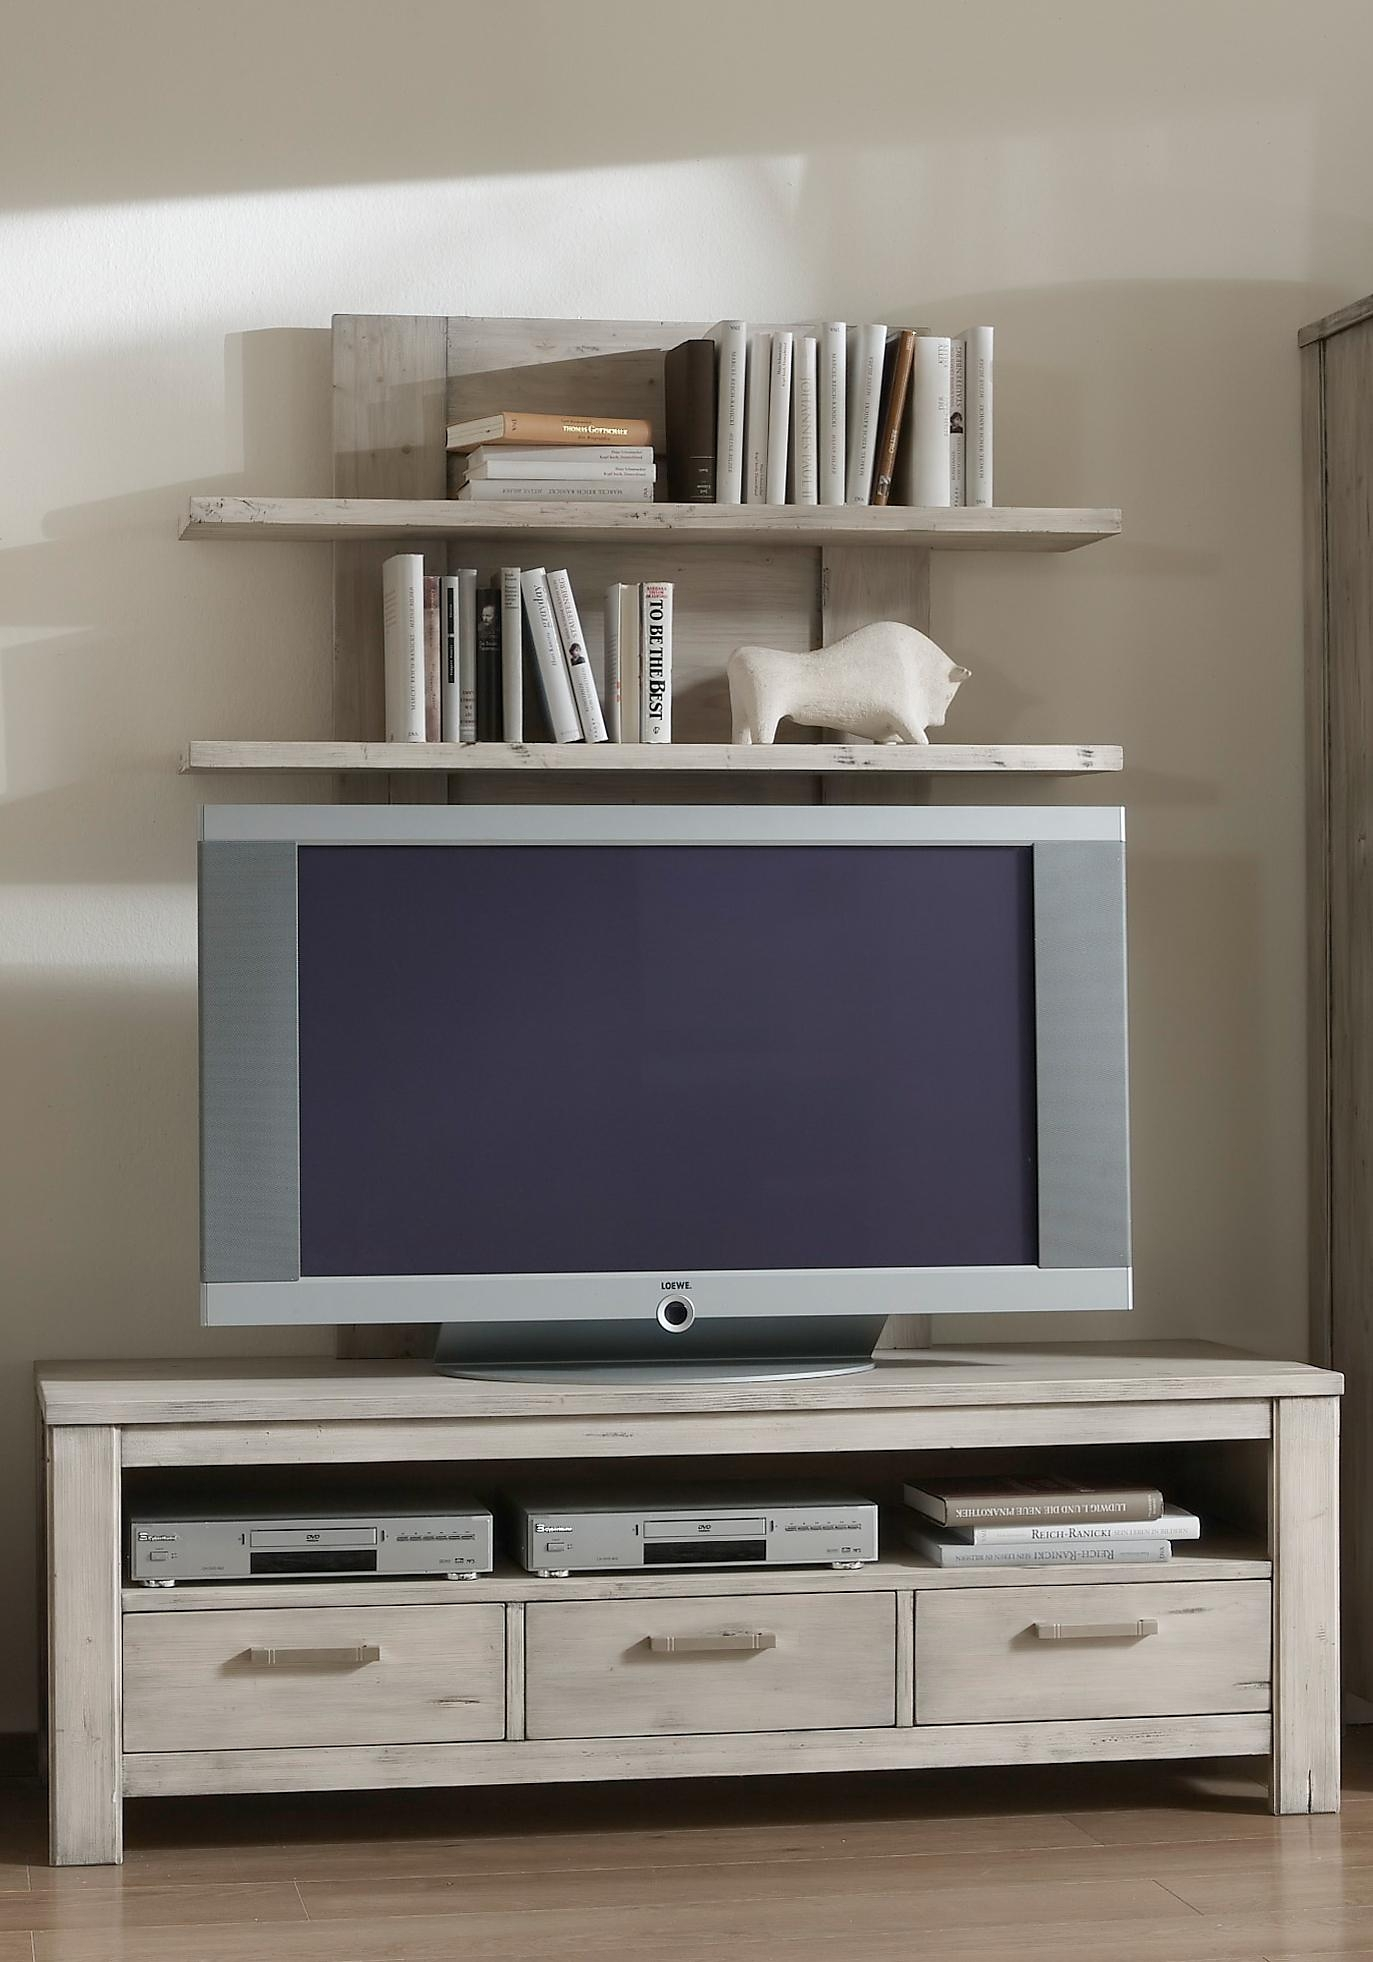 favorit tv paneel lucca breedte 120 cm online bij otto. Black Bedroom Furniture Sets. Home Design Ideas